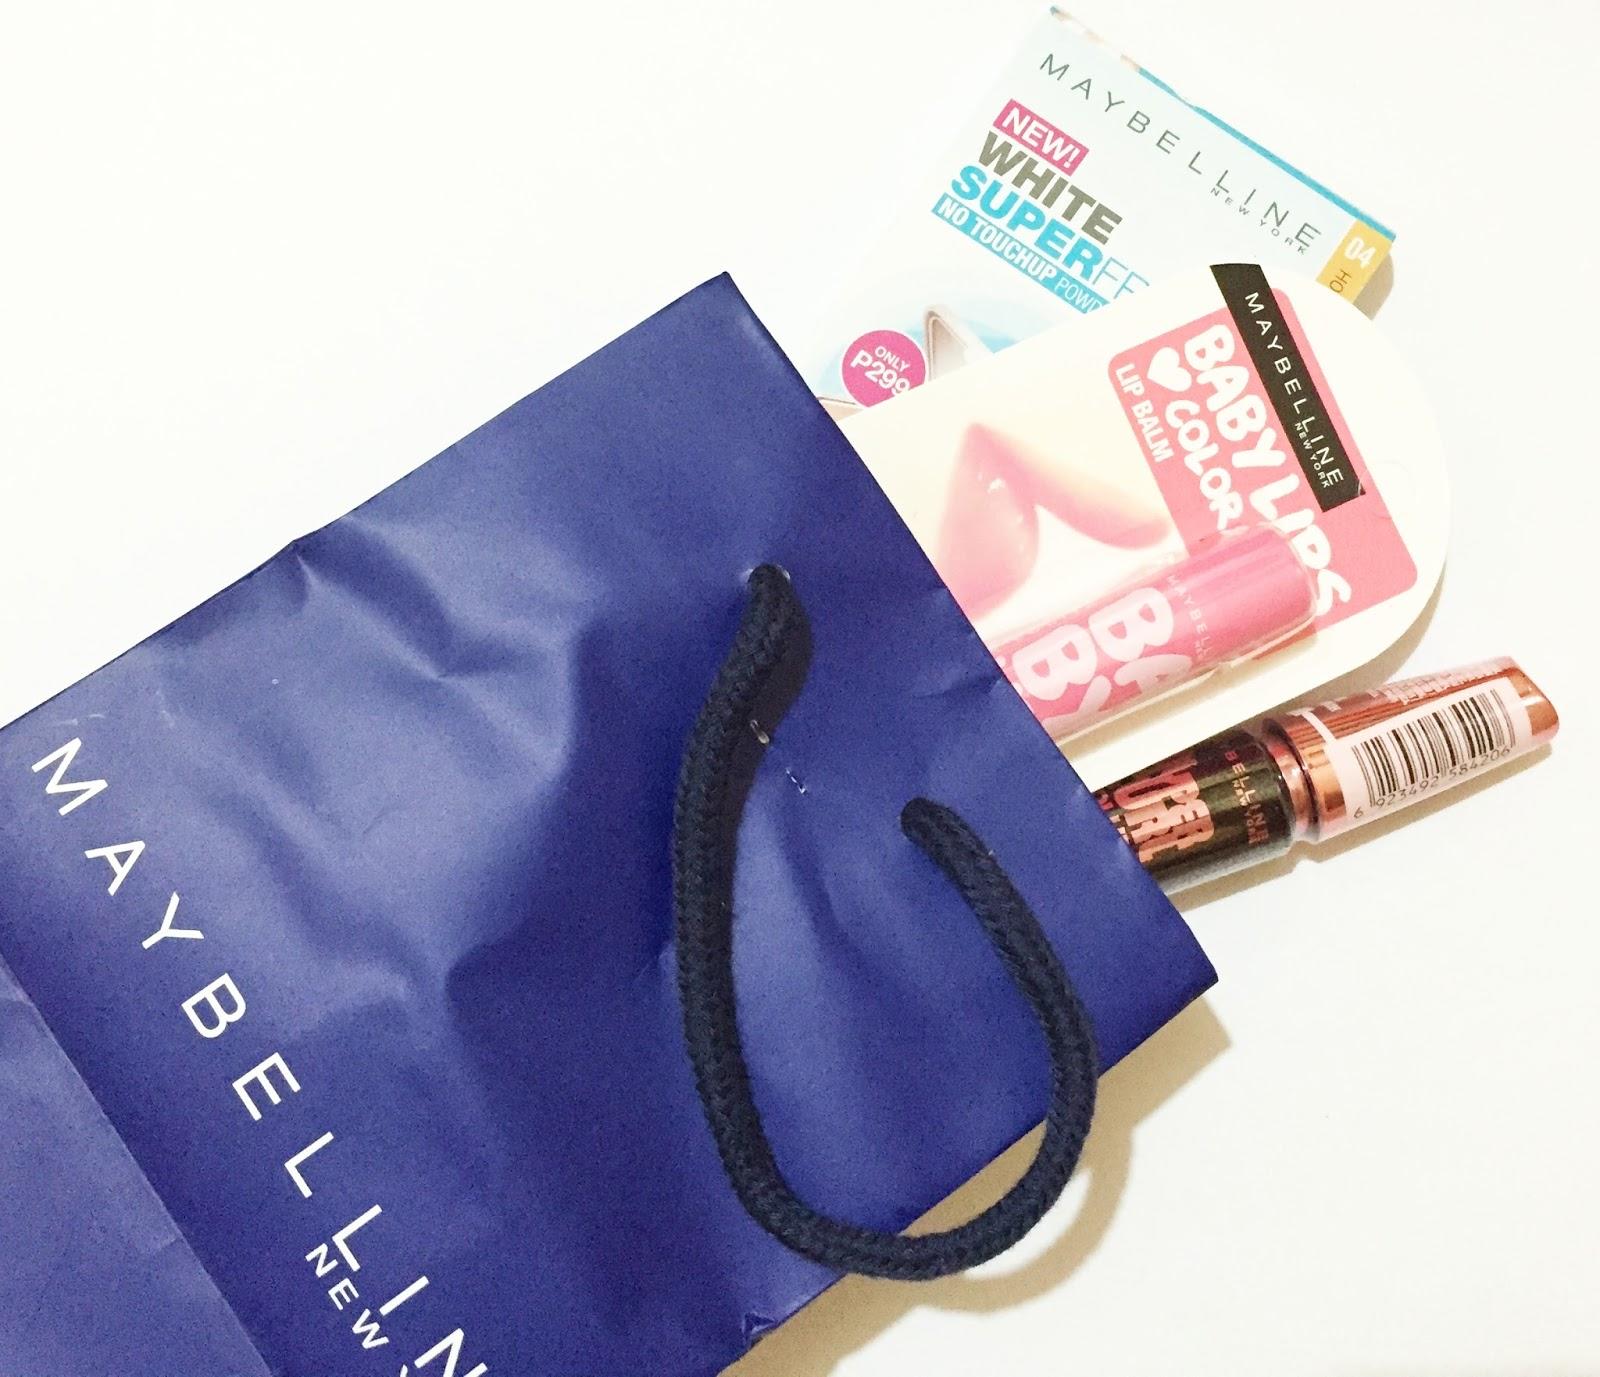 Maybelline Hypercurl Mascara Giveaway